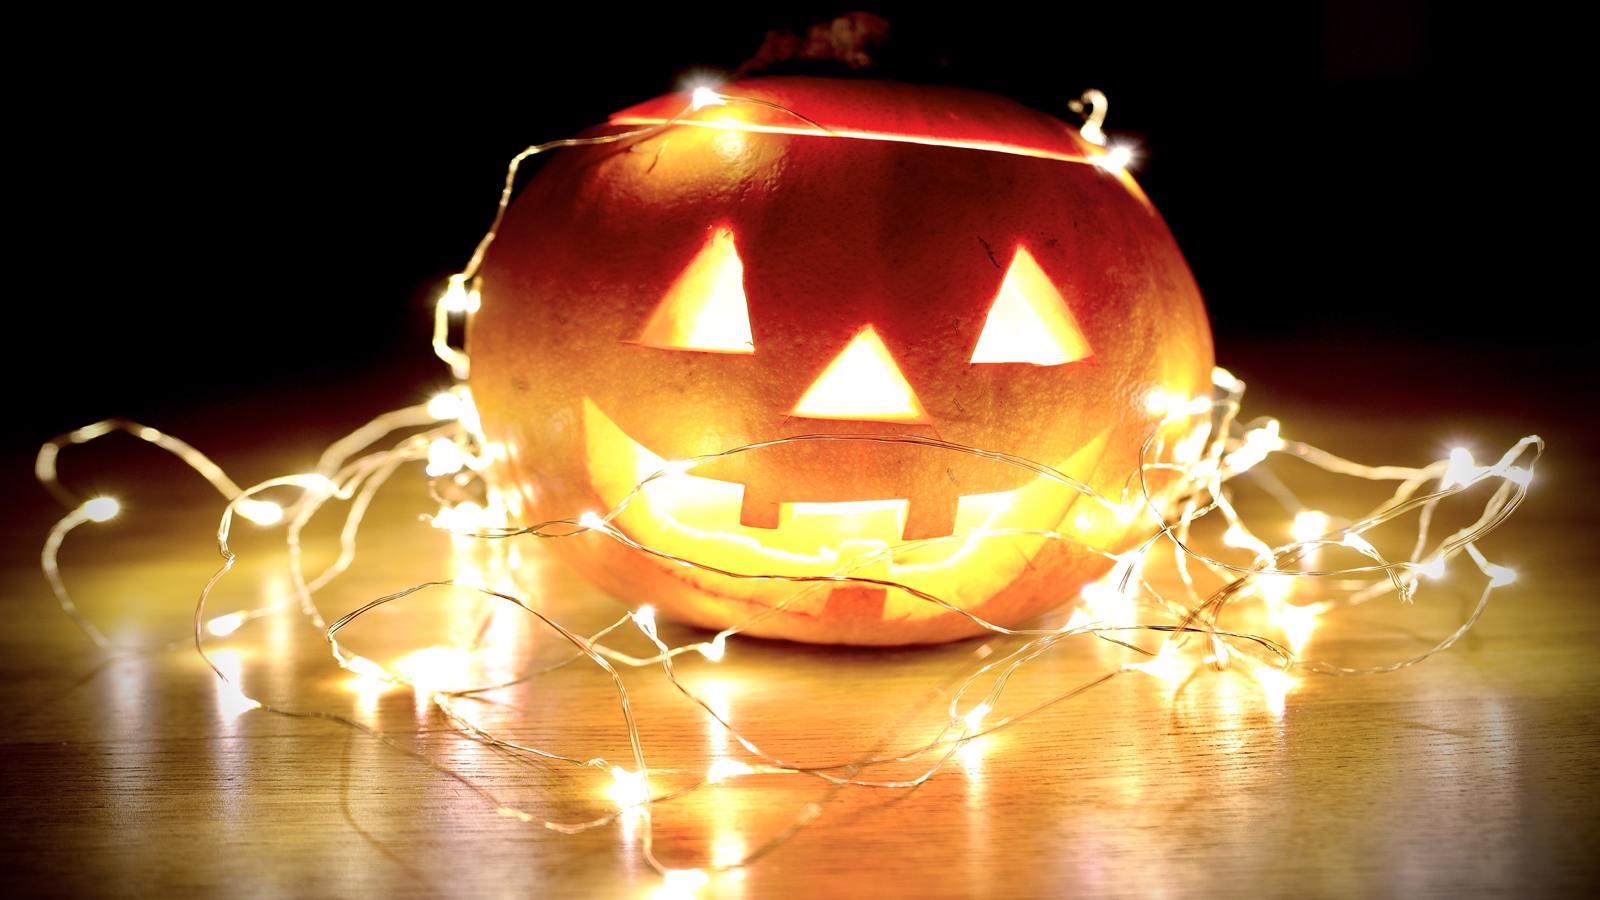 10 Beginner-Friendly Horror Movies To Binge-Watch This Halloween